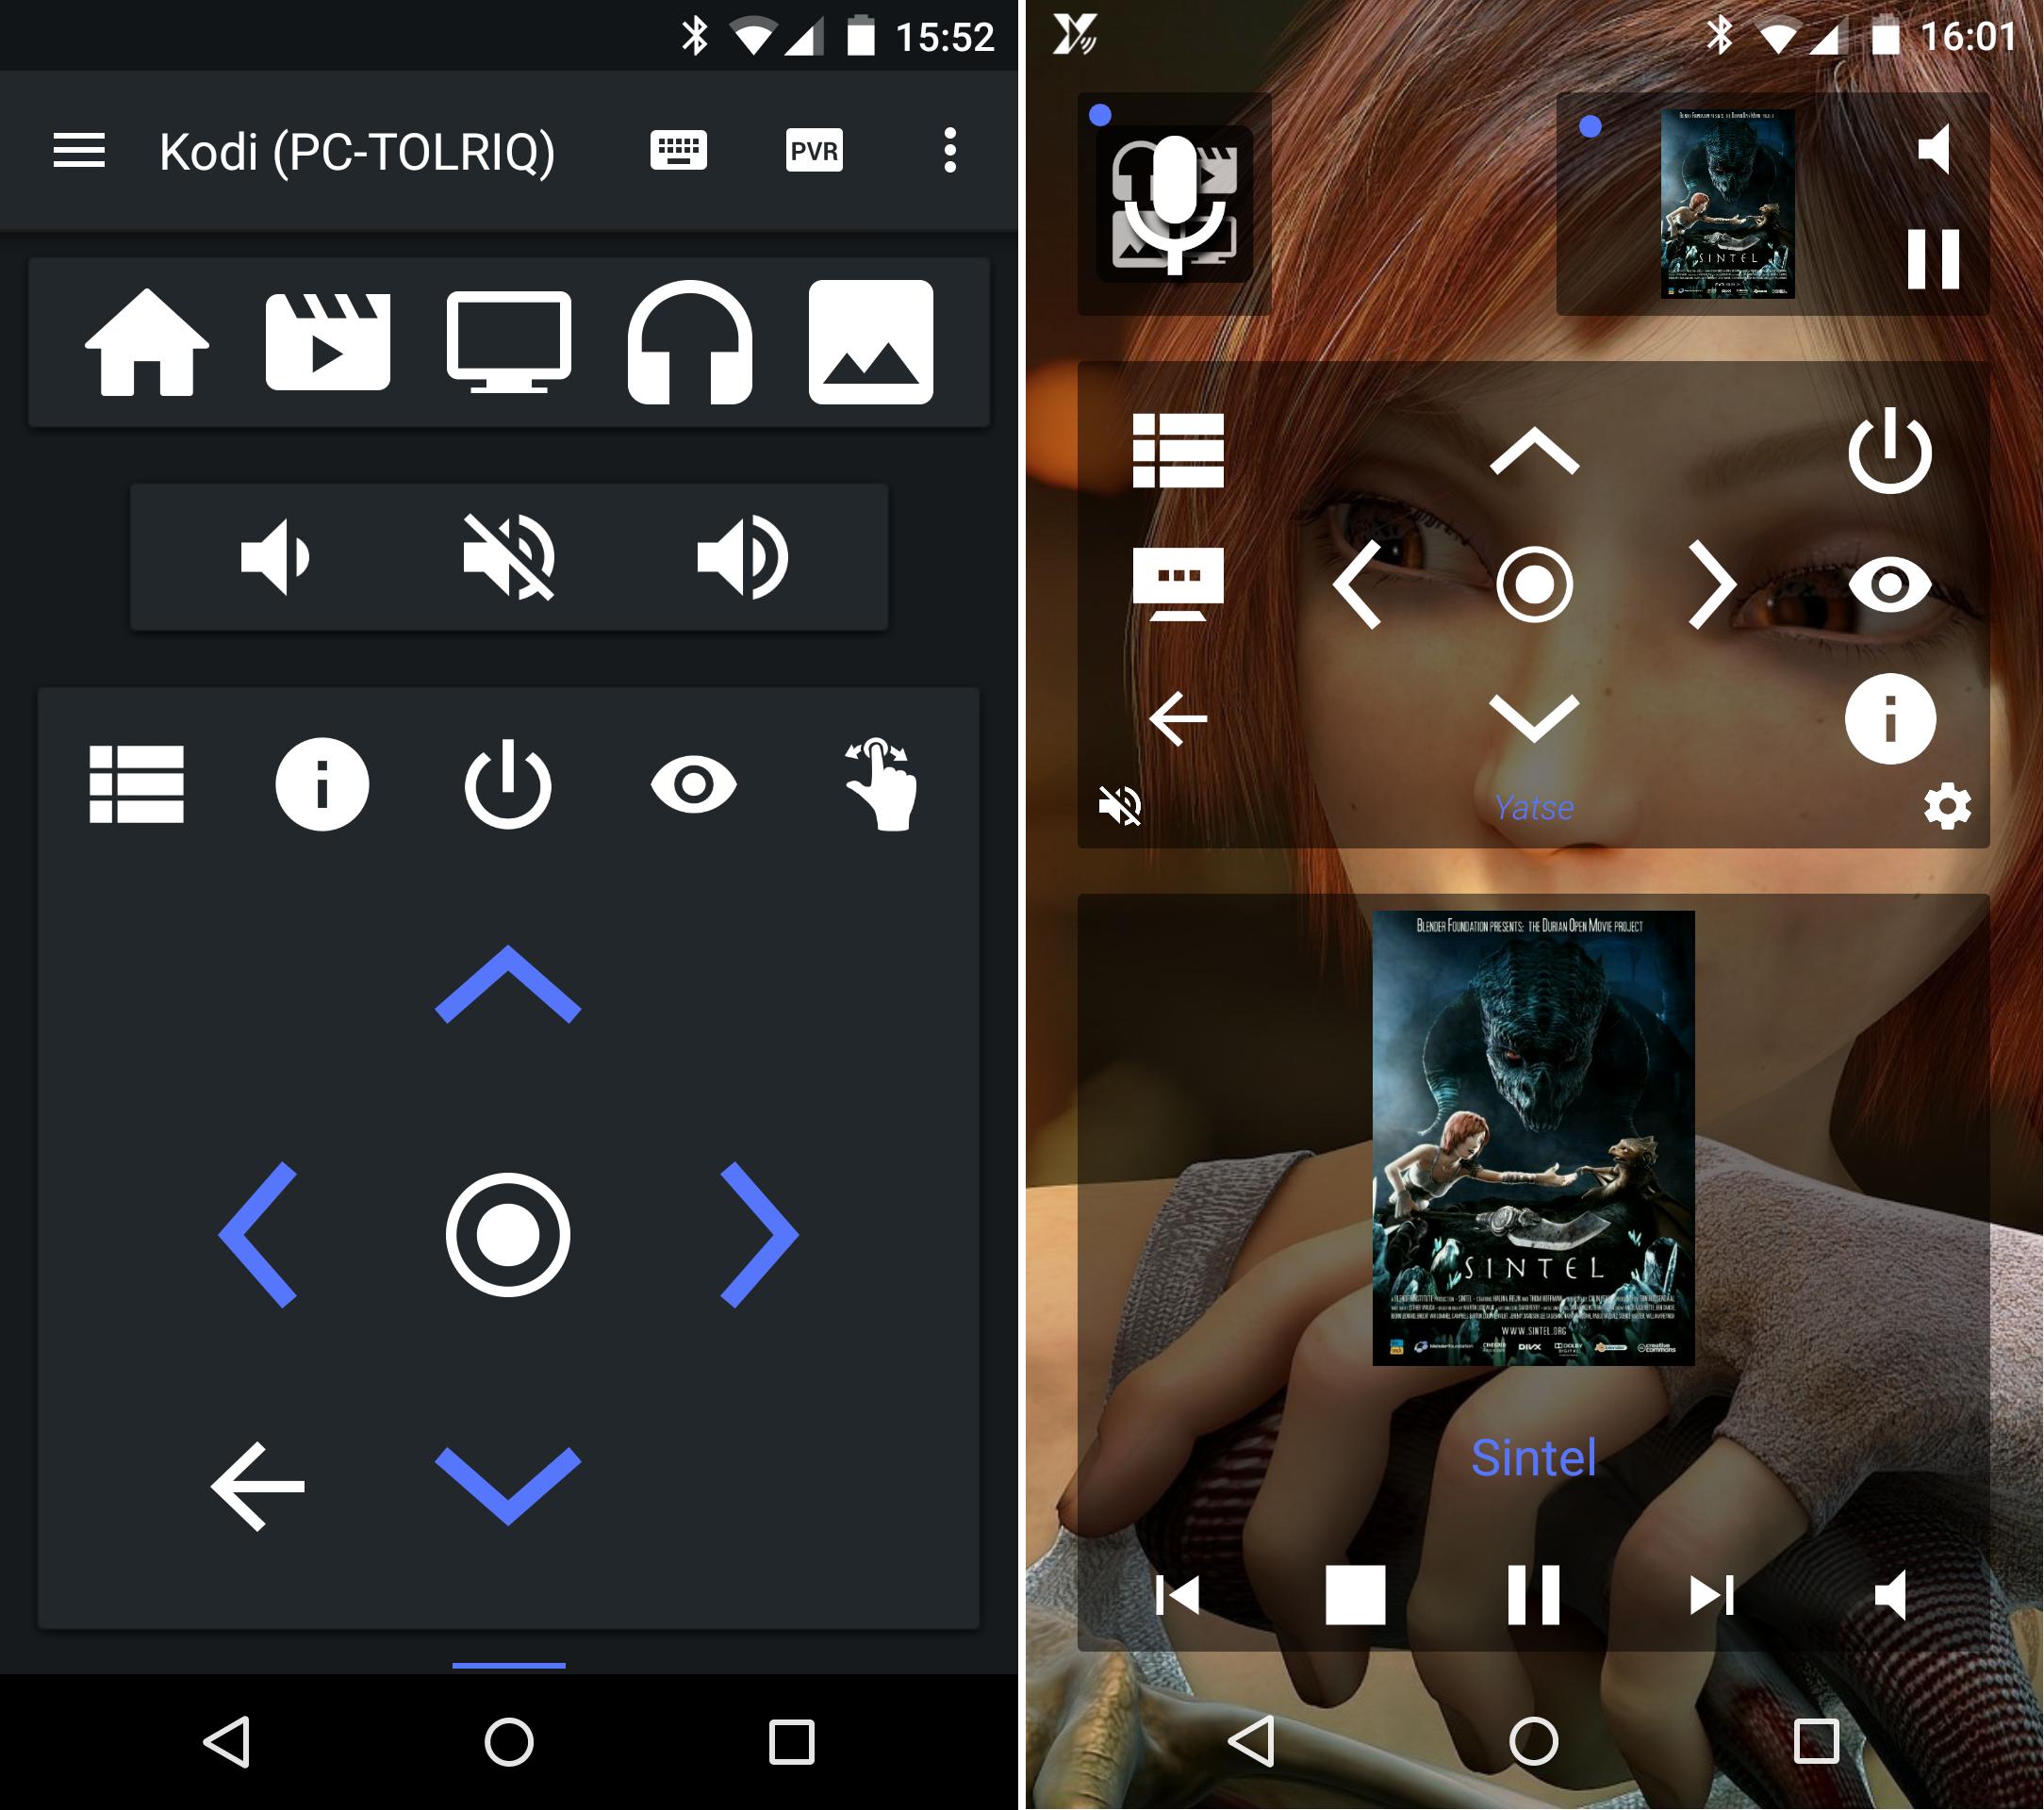 Yatse - Android